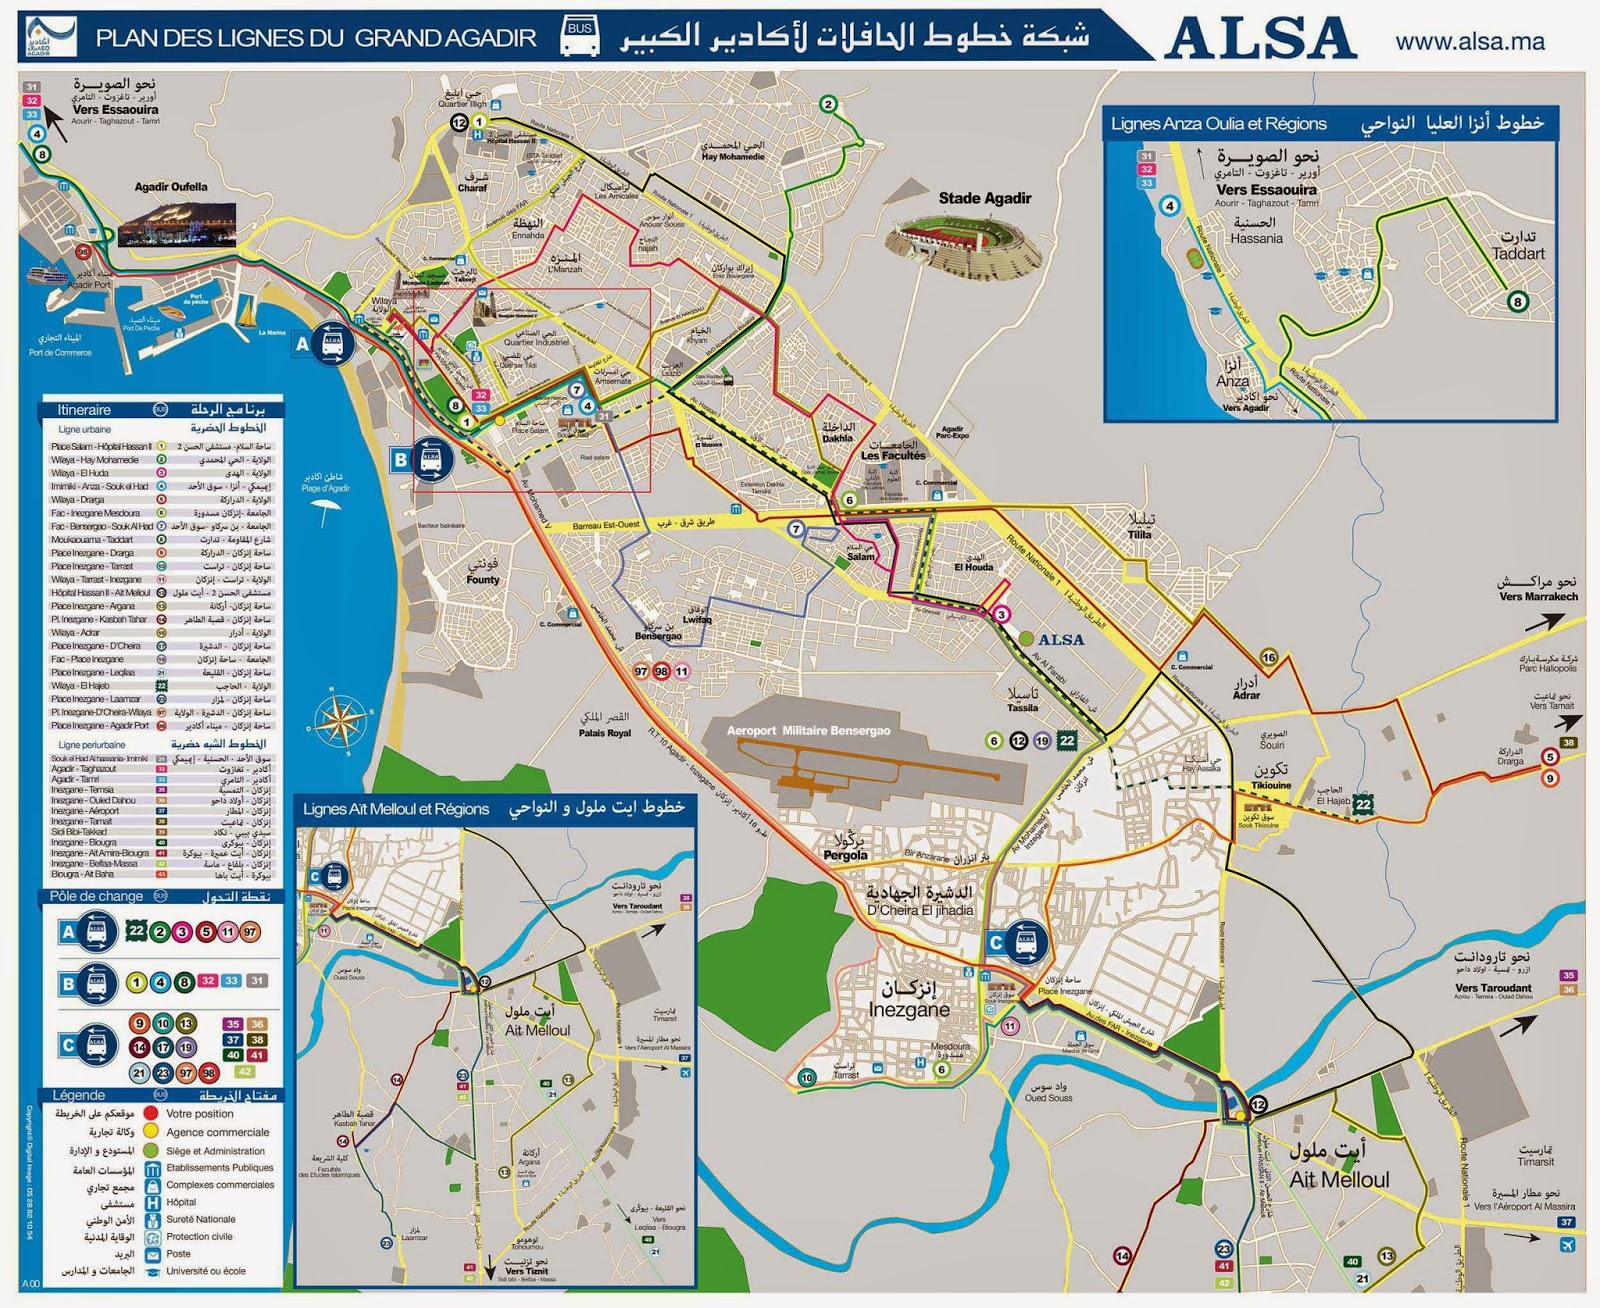 Agadir Tourist Guide Check Out Agadir Tourist Guide